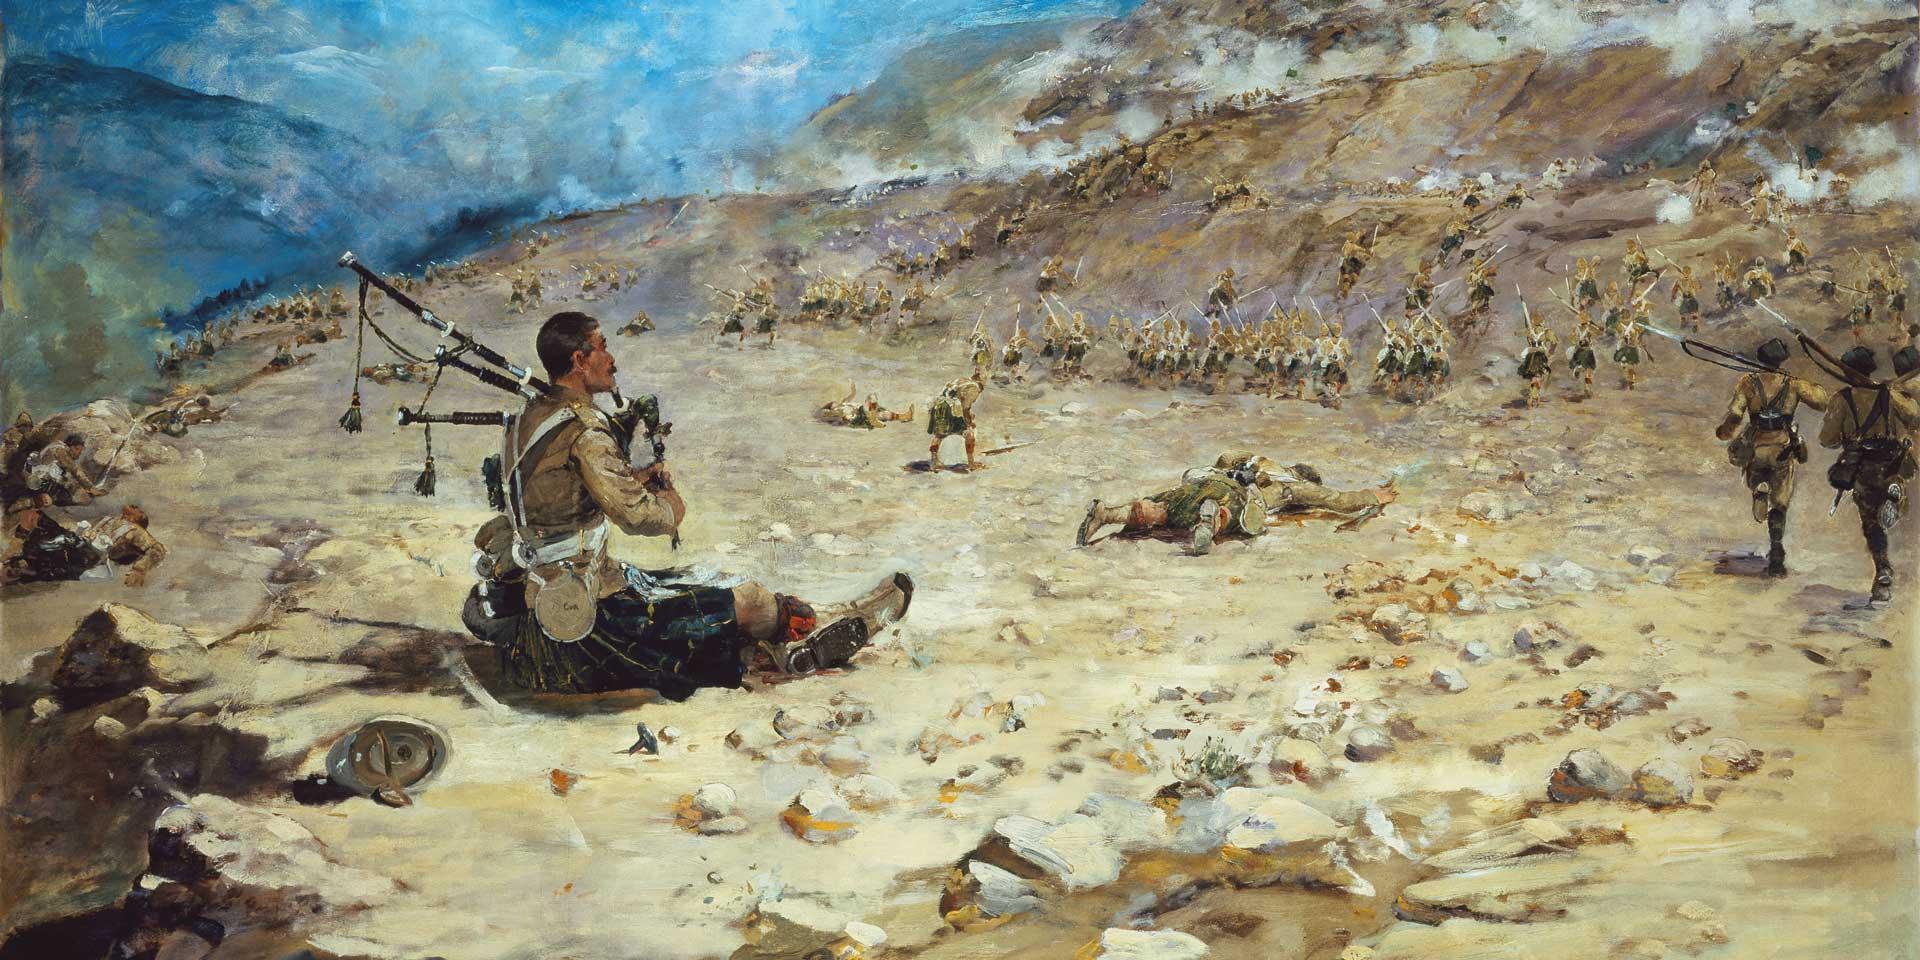 Piper George Findlater, The Gordon Highlanders, winning the Victoria Cross at Dargai, 1897